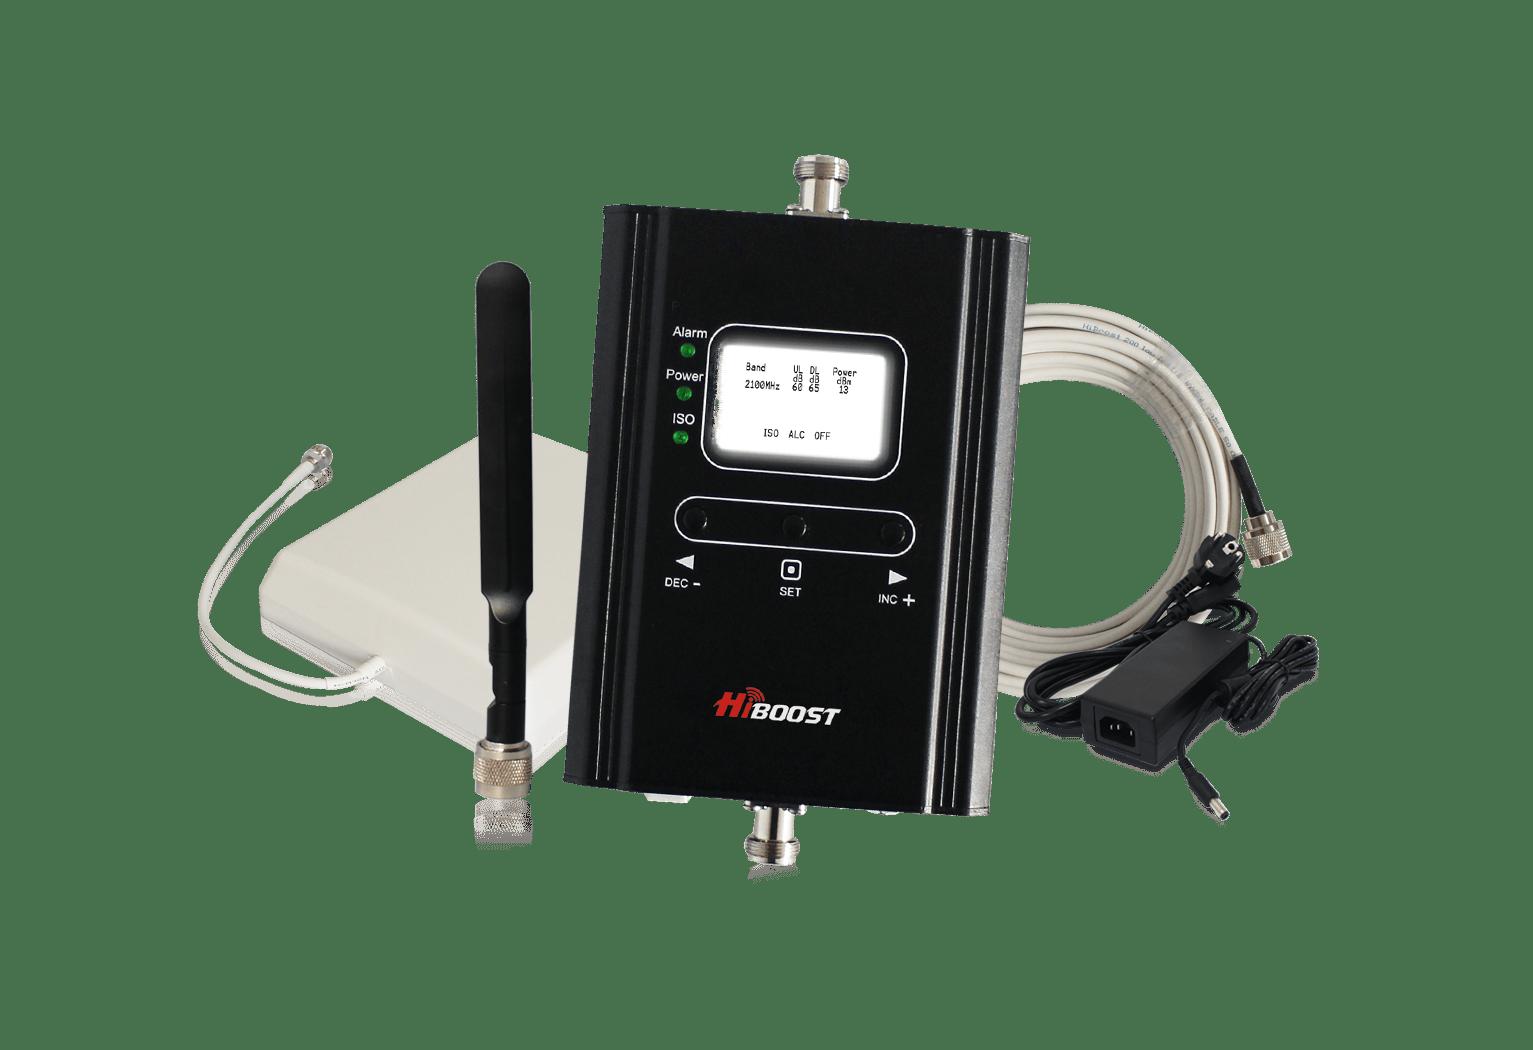 2100-3g-Single band-kit-mobile phone amplifier